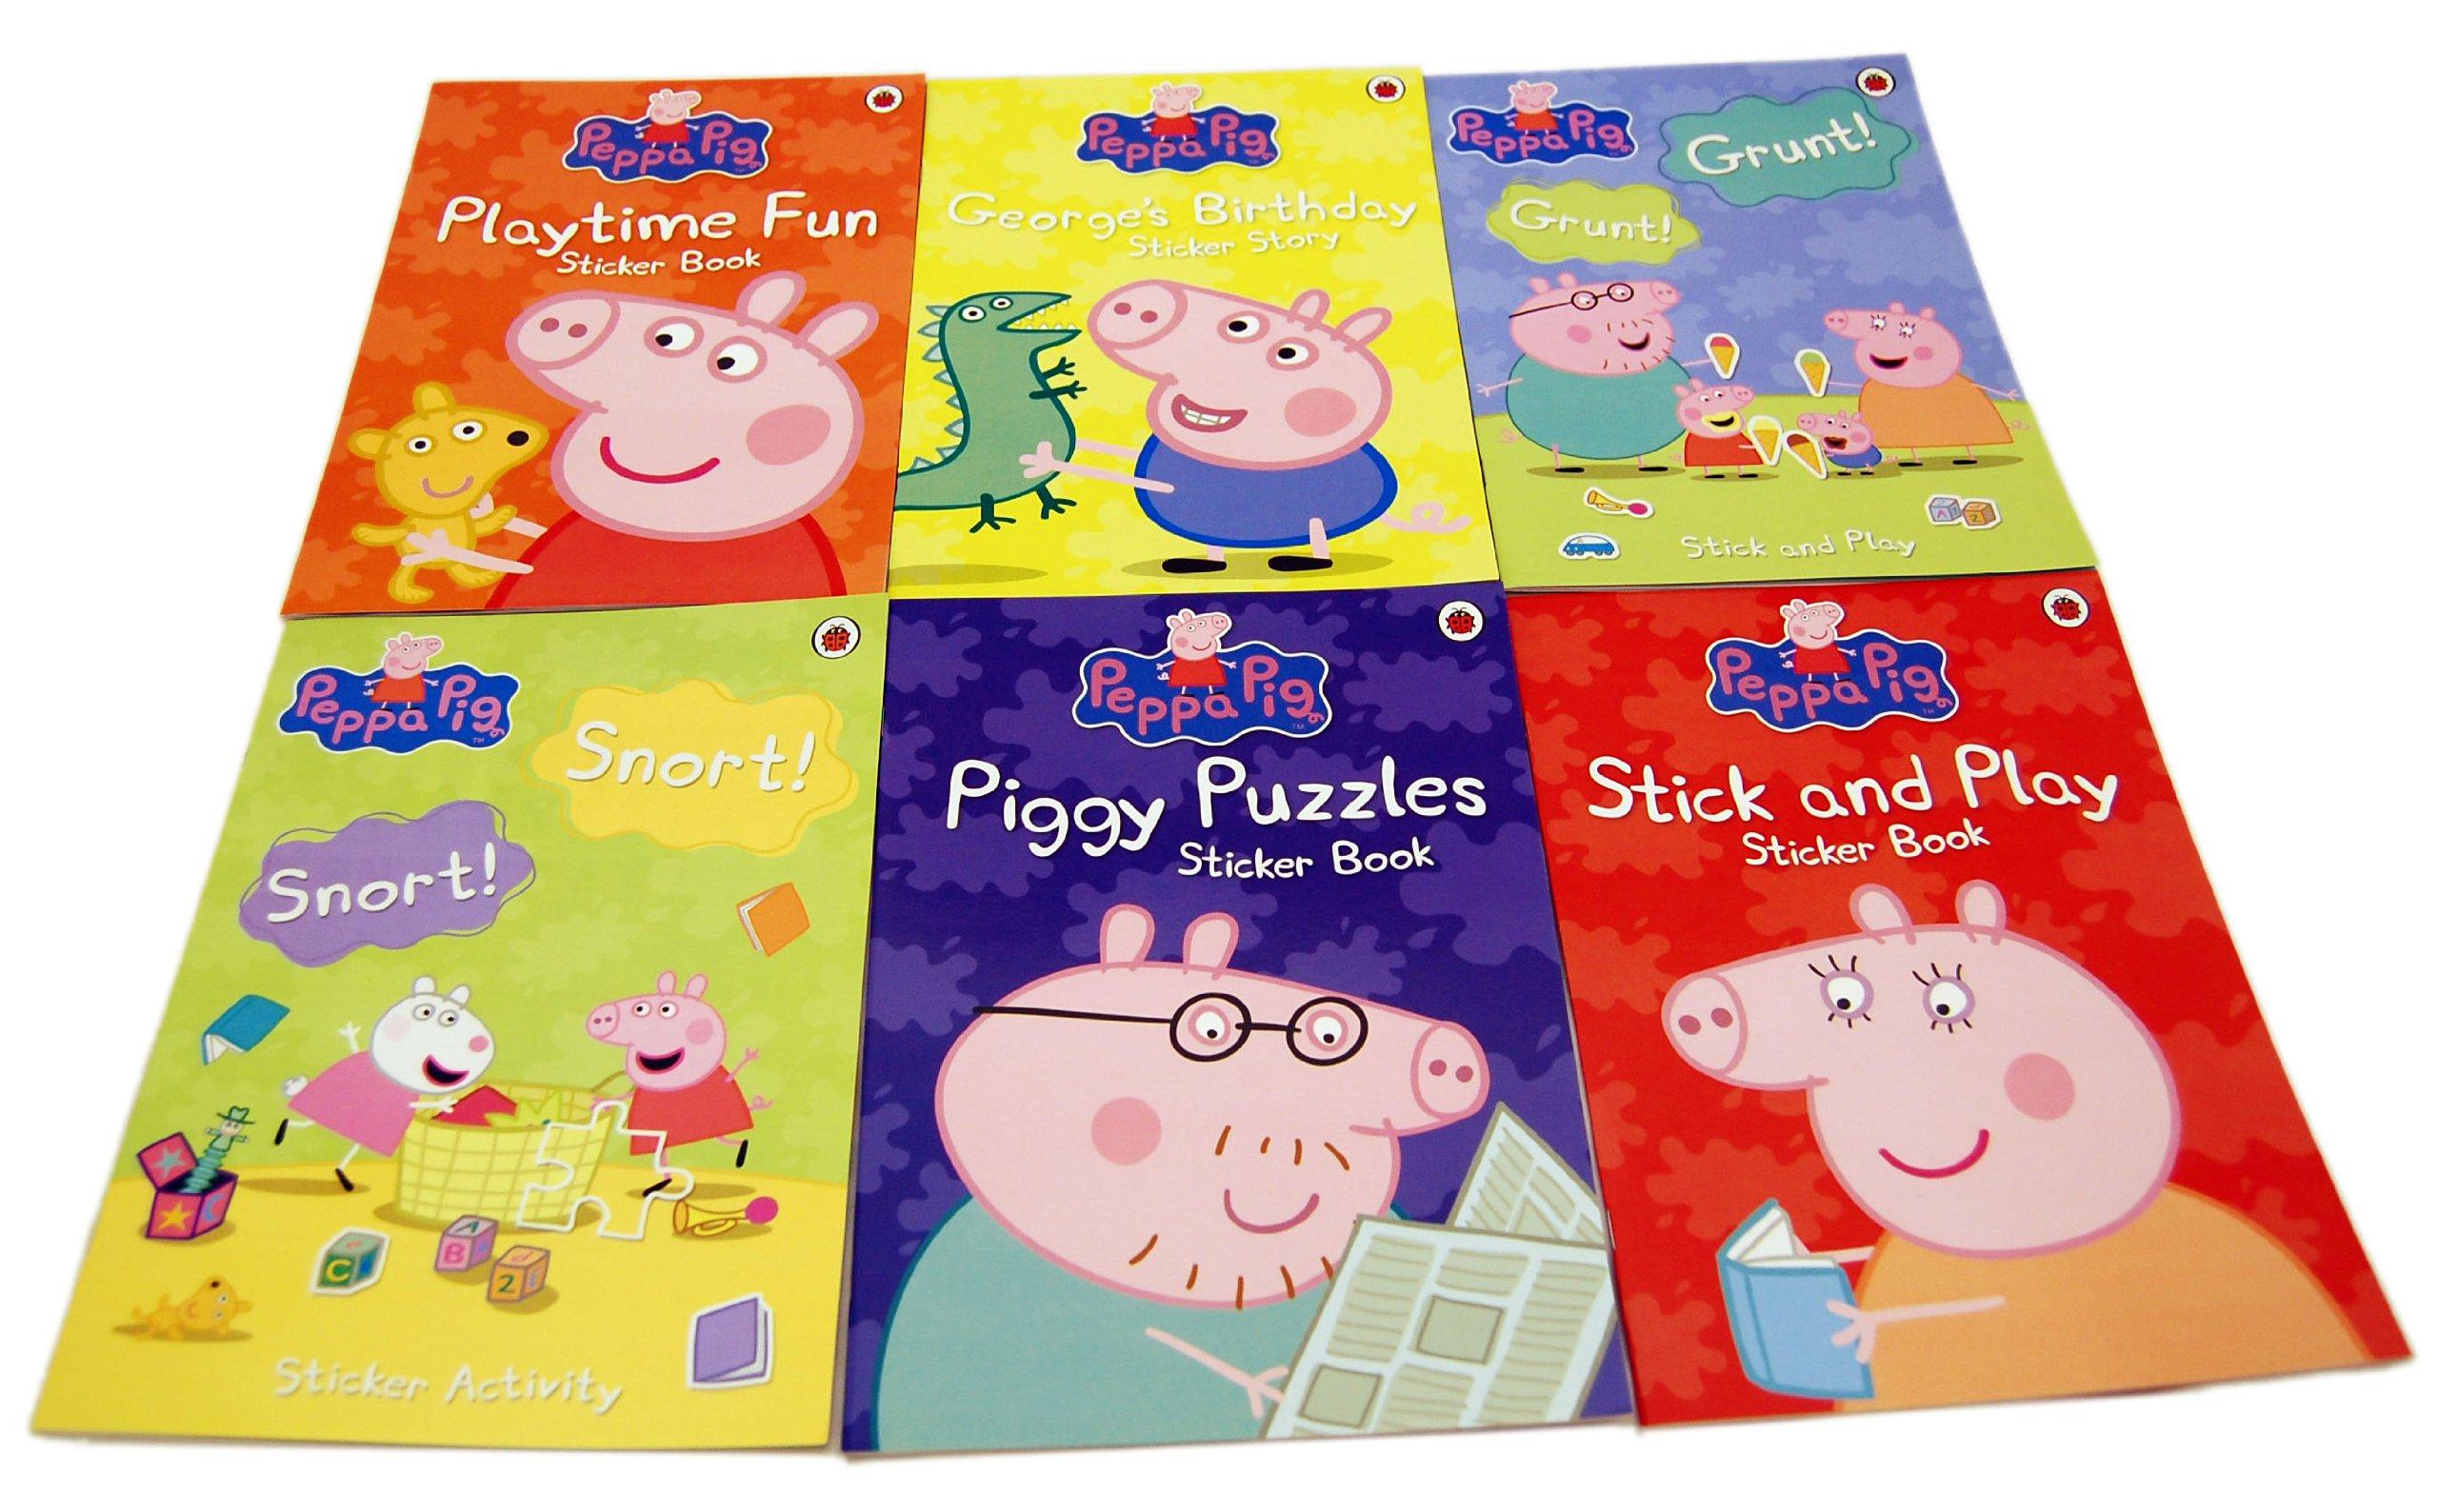 Peppa Pig Sticker Album 5 Sticker Sheets Sticker Album /& Cut Out Bookmarks Gift